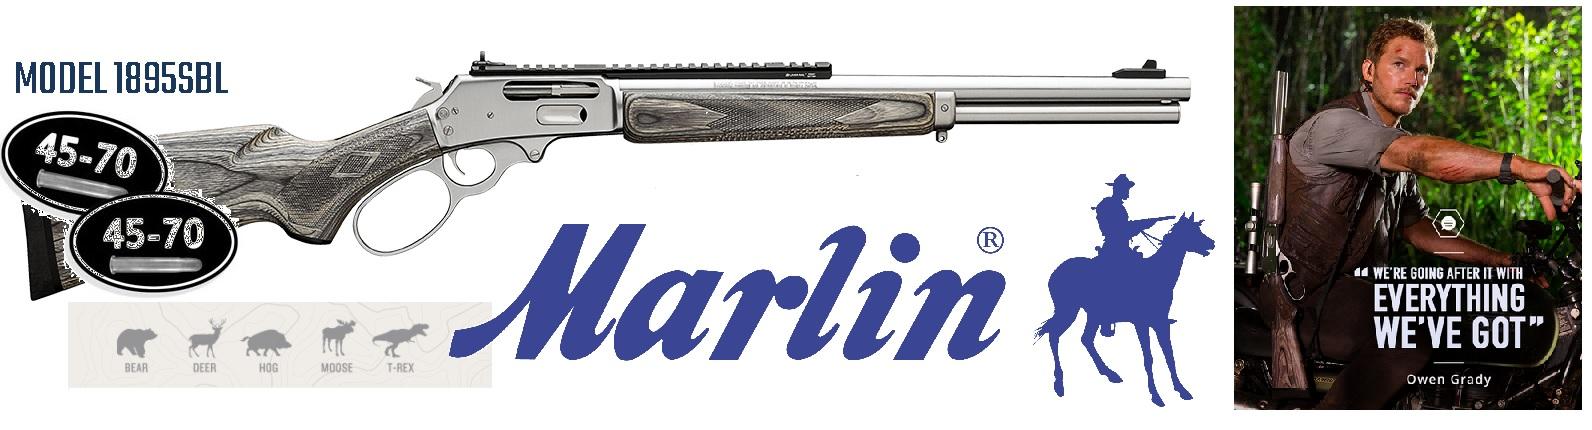 Marlin-026495018238-Bill-Board